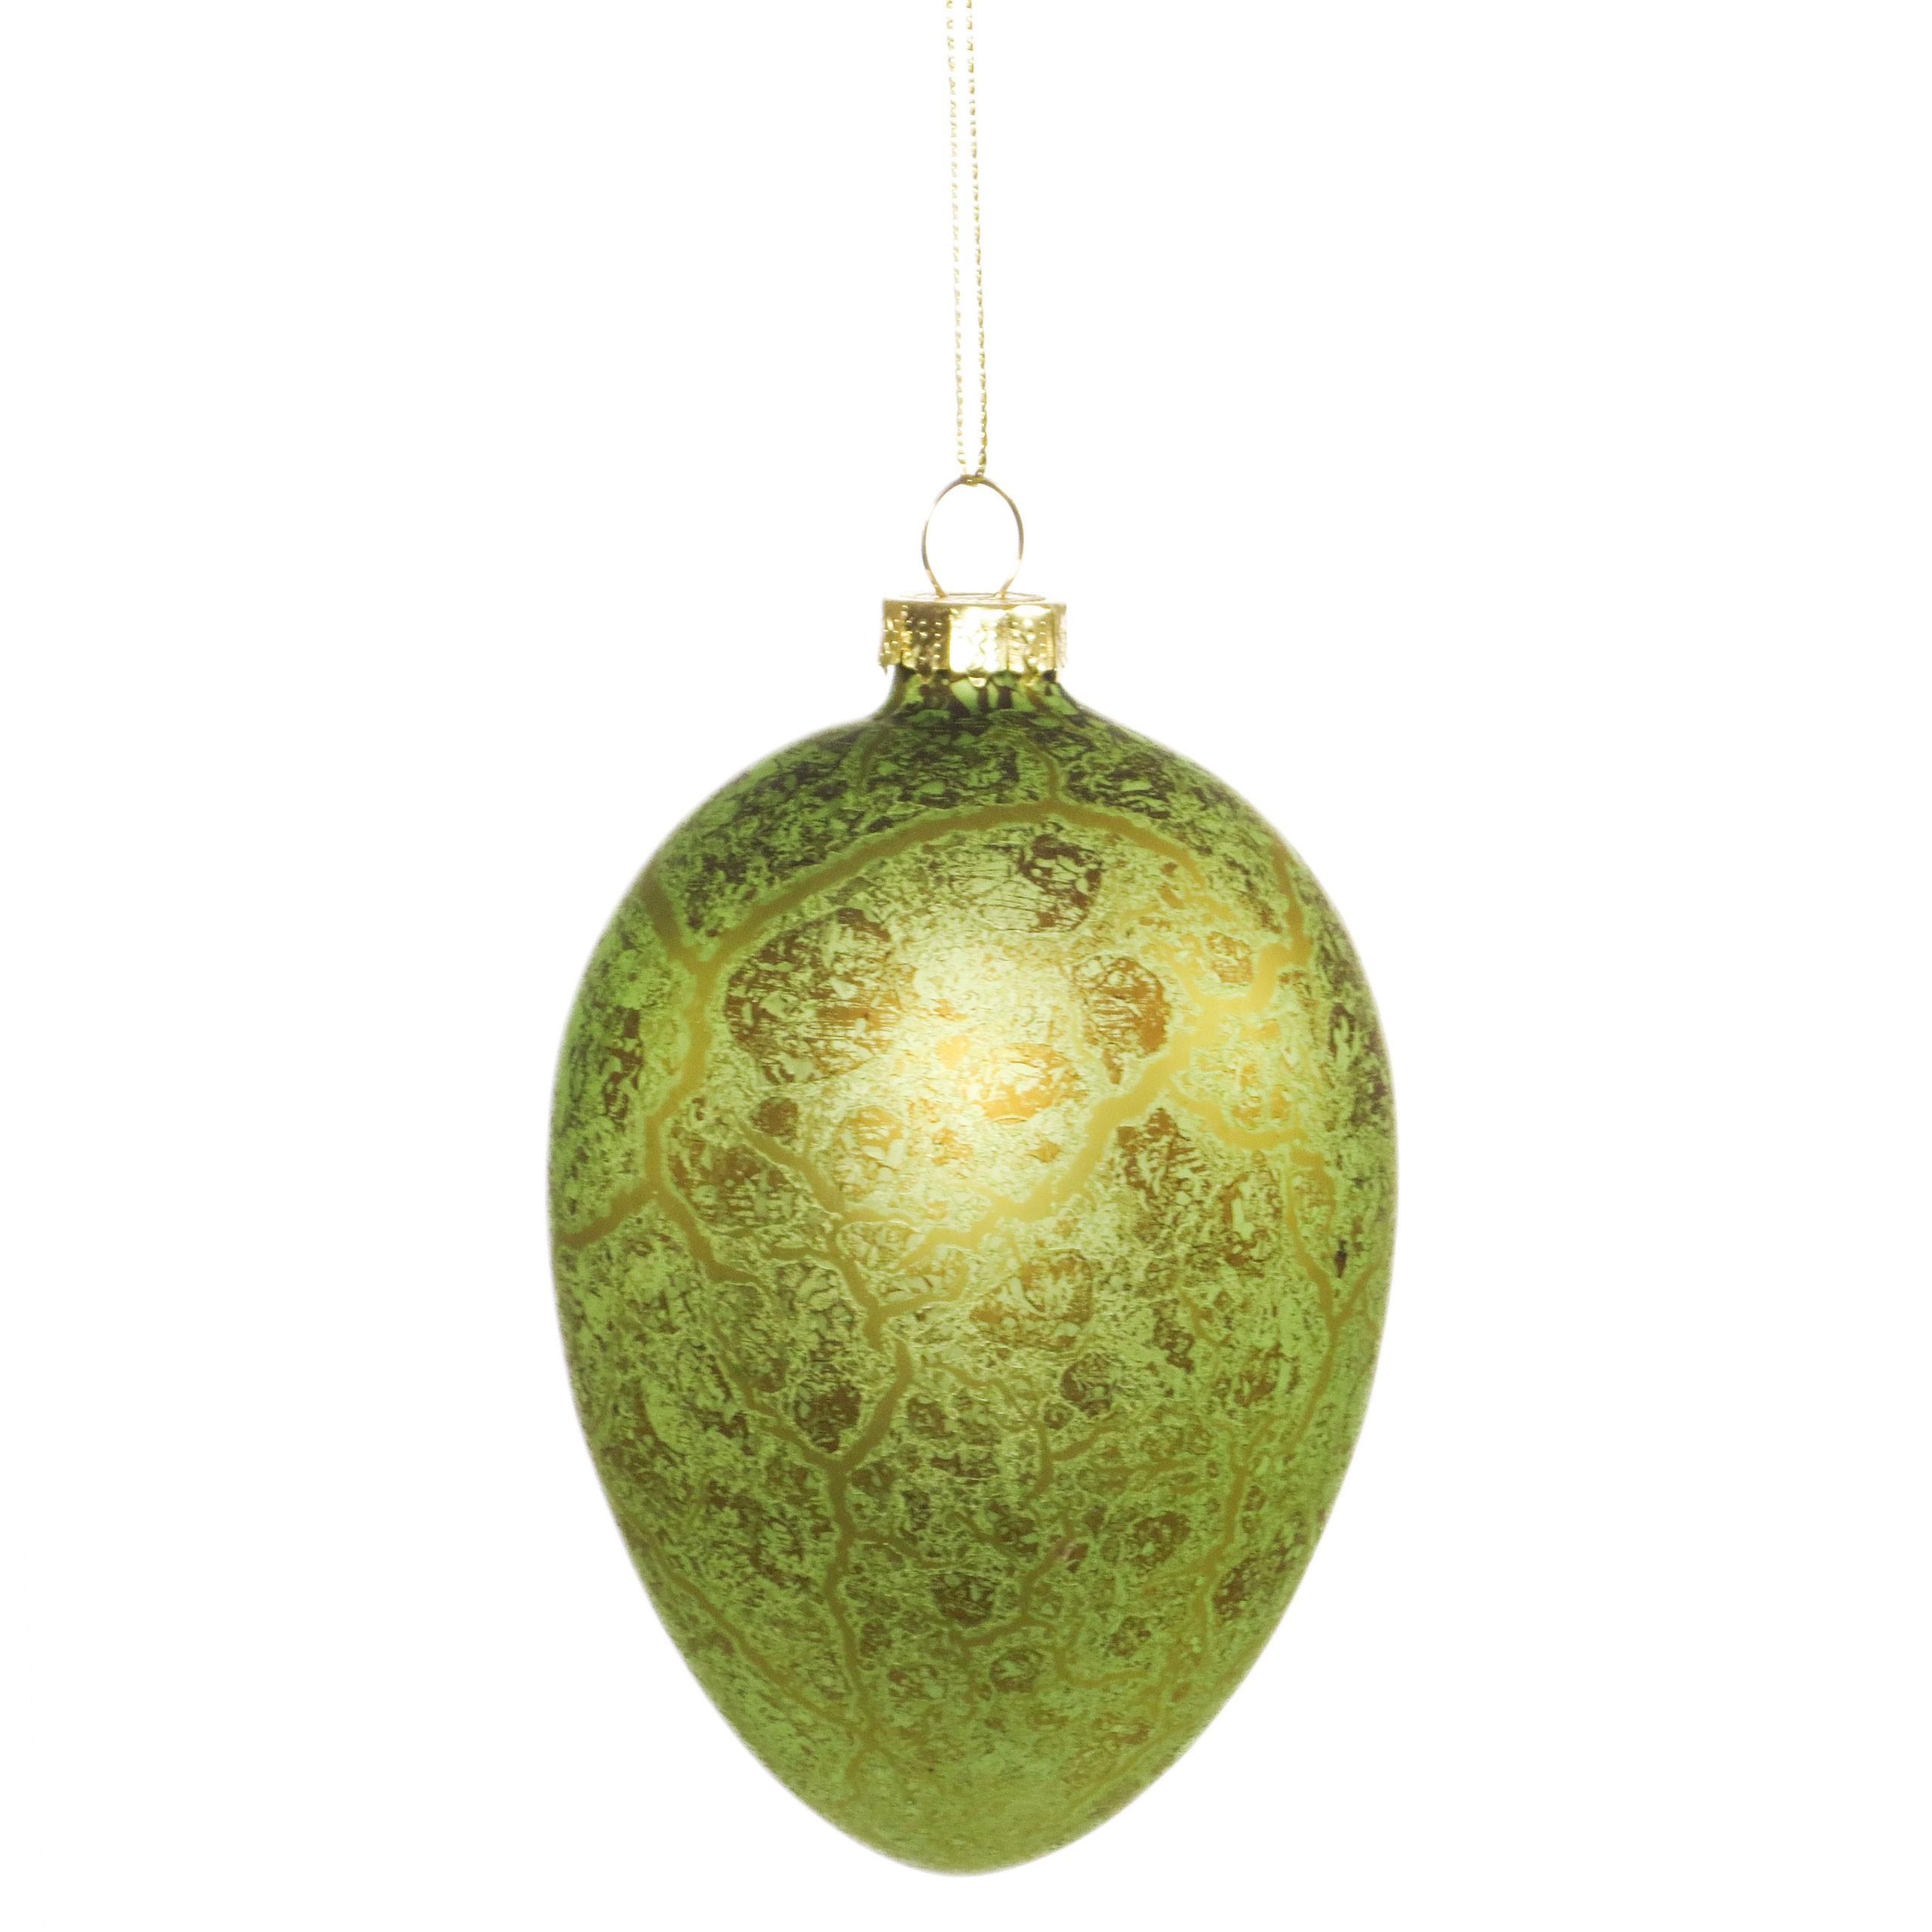 Am Design Deko am design osterei antik aus glas 10cm grün ostern osterei 4878